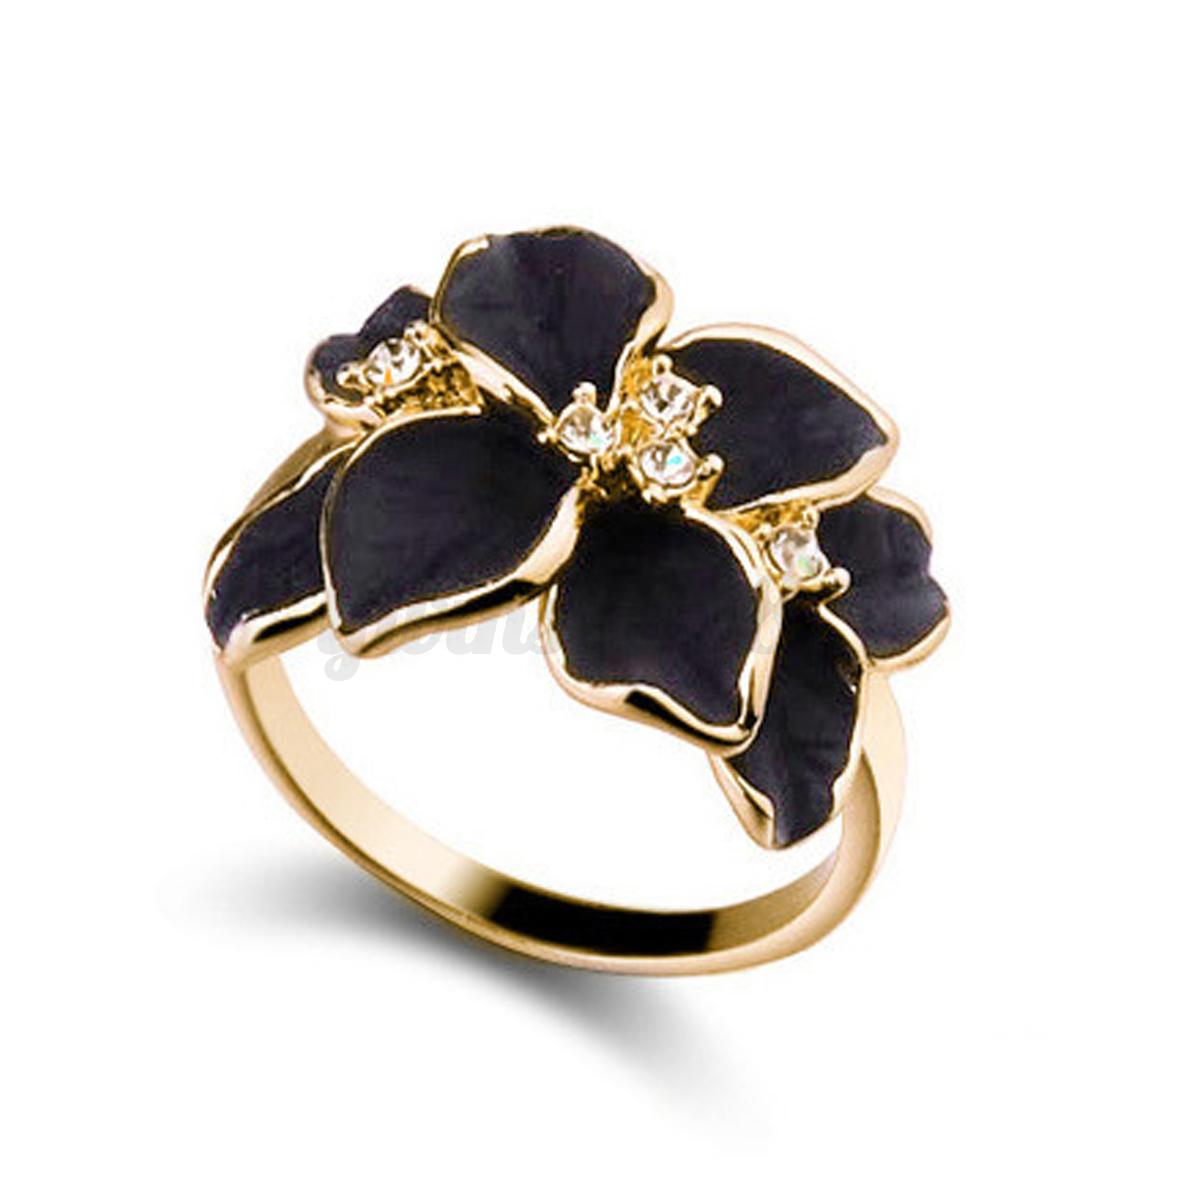 bague chat rose anneau bijoux cristal strass fantaisie. Black Bedroom Furniture Sets. Home Design Ideas